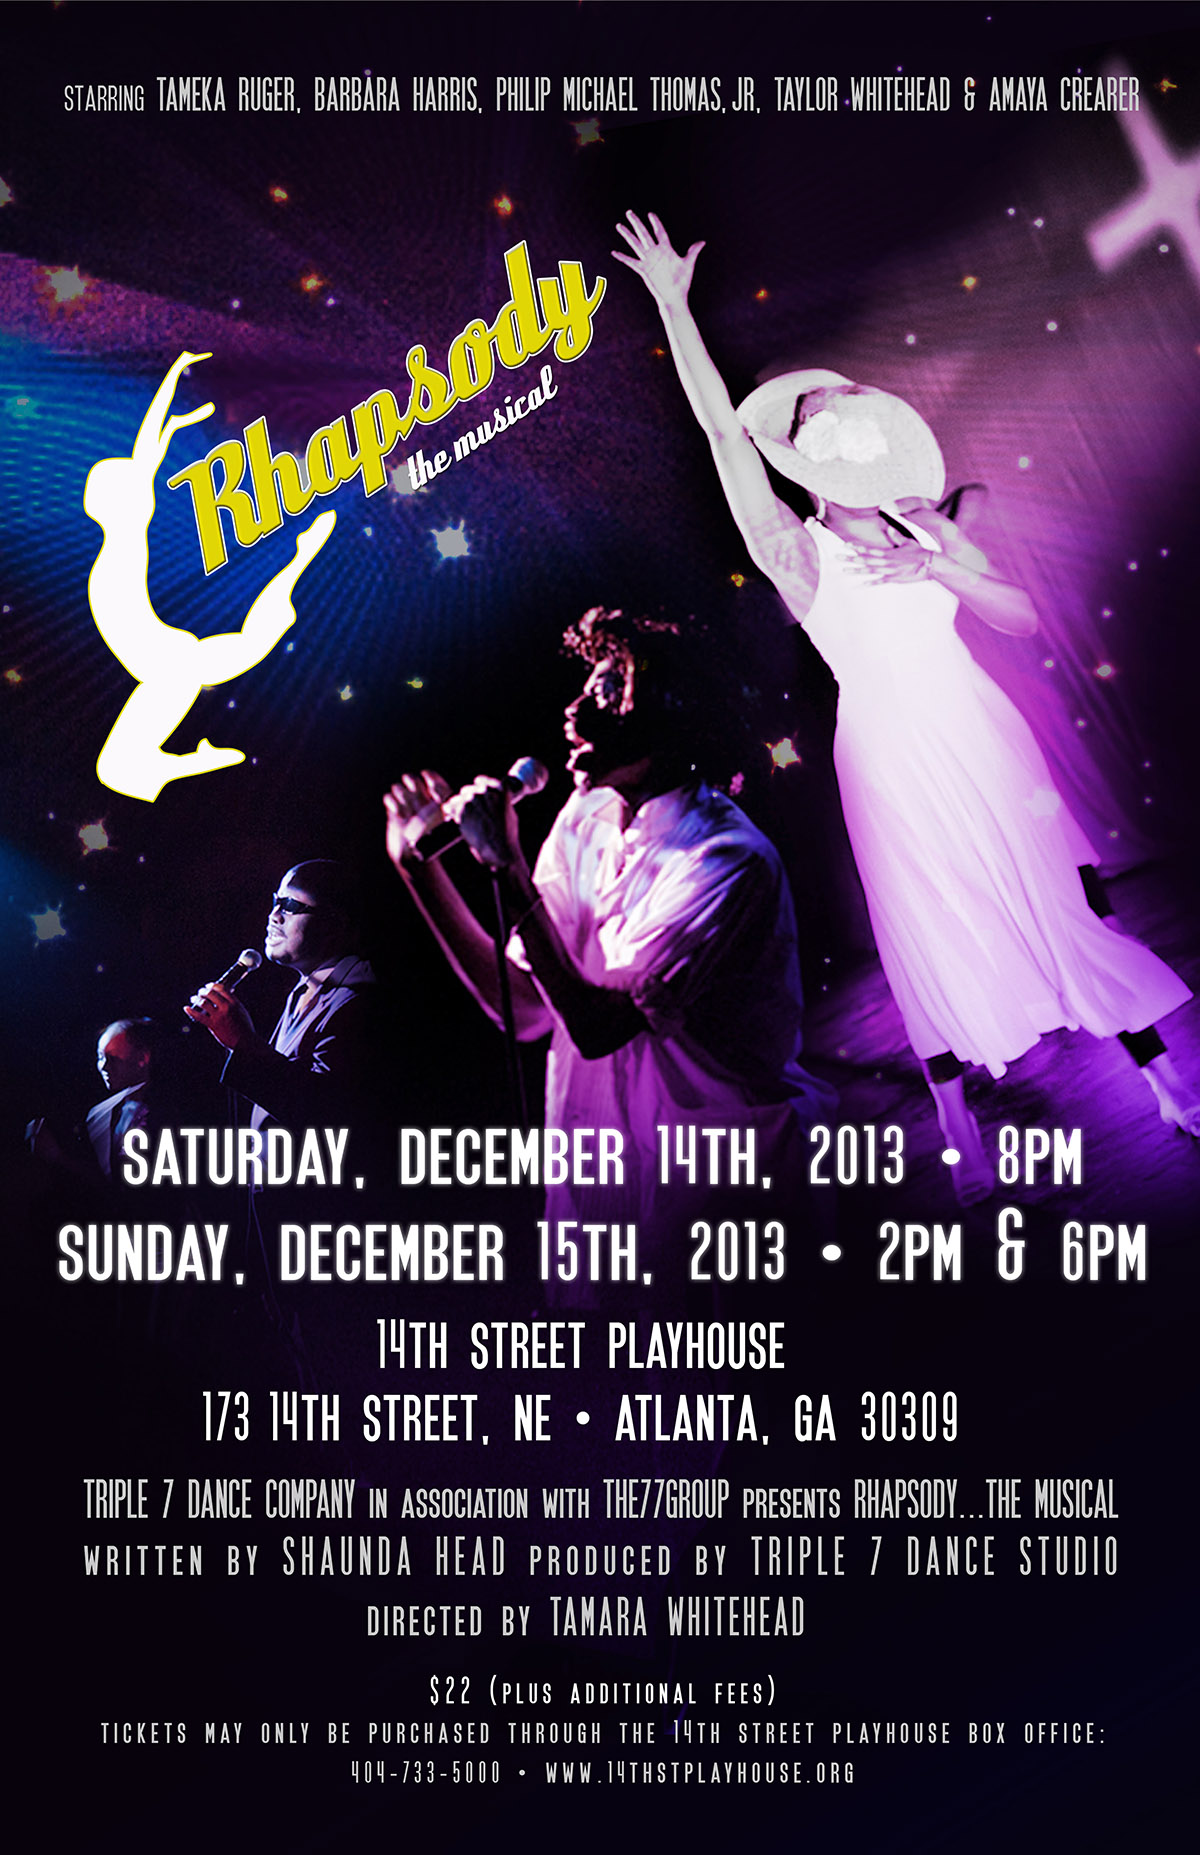 Rhapsody: The Musical - December 2010 - December 2013